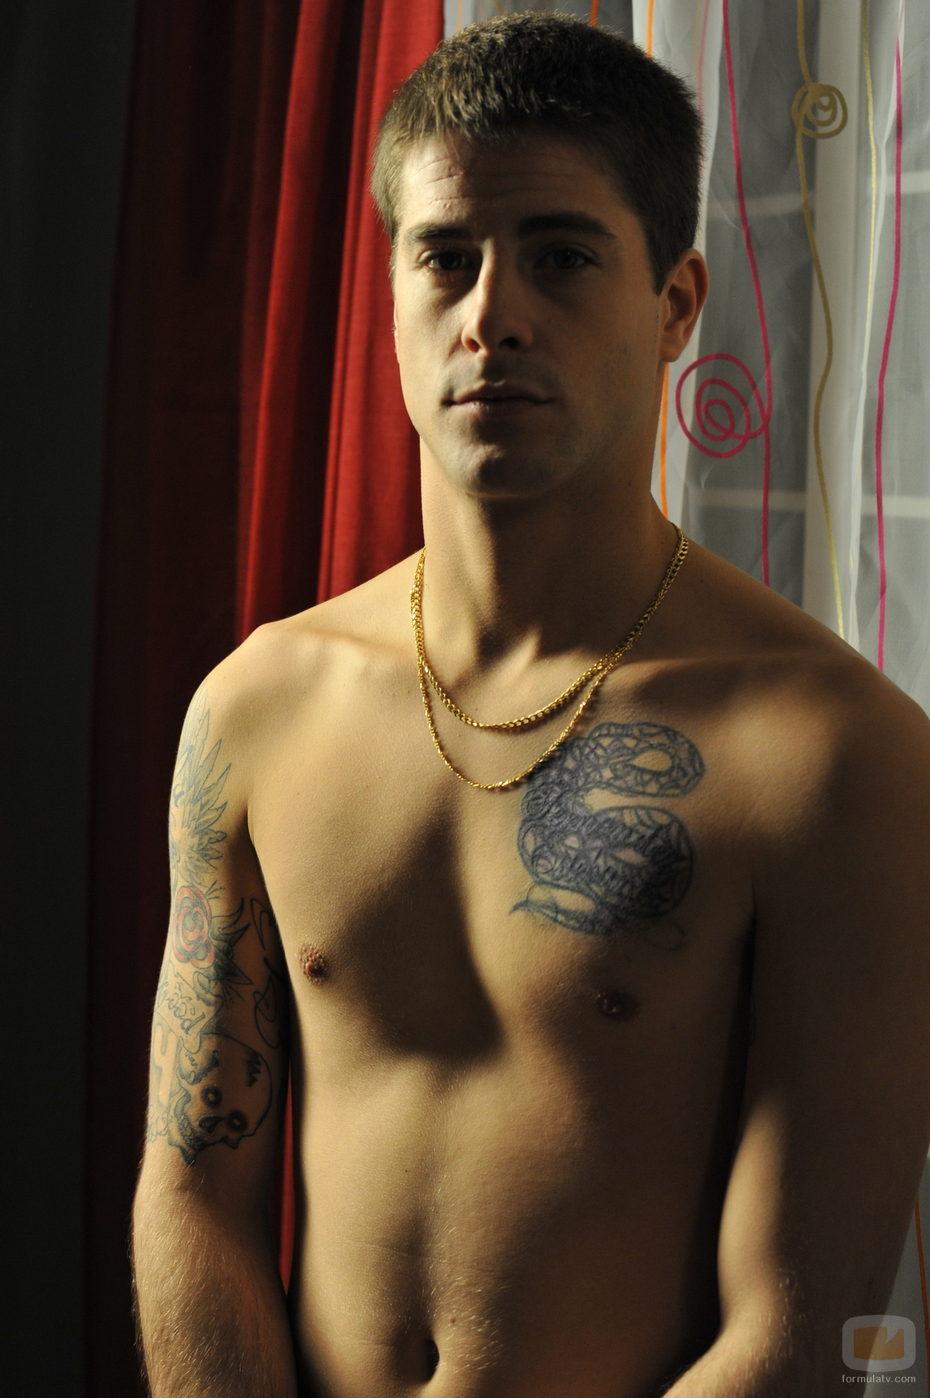 Luis Fernández, Culebra, desnudo